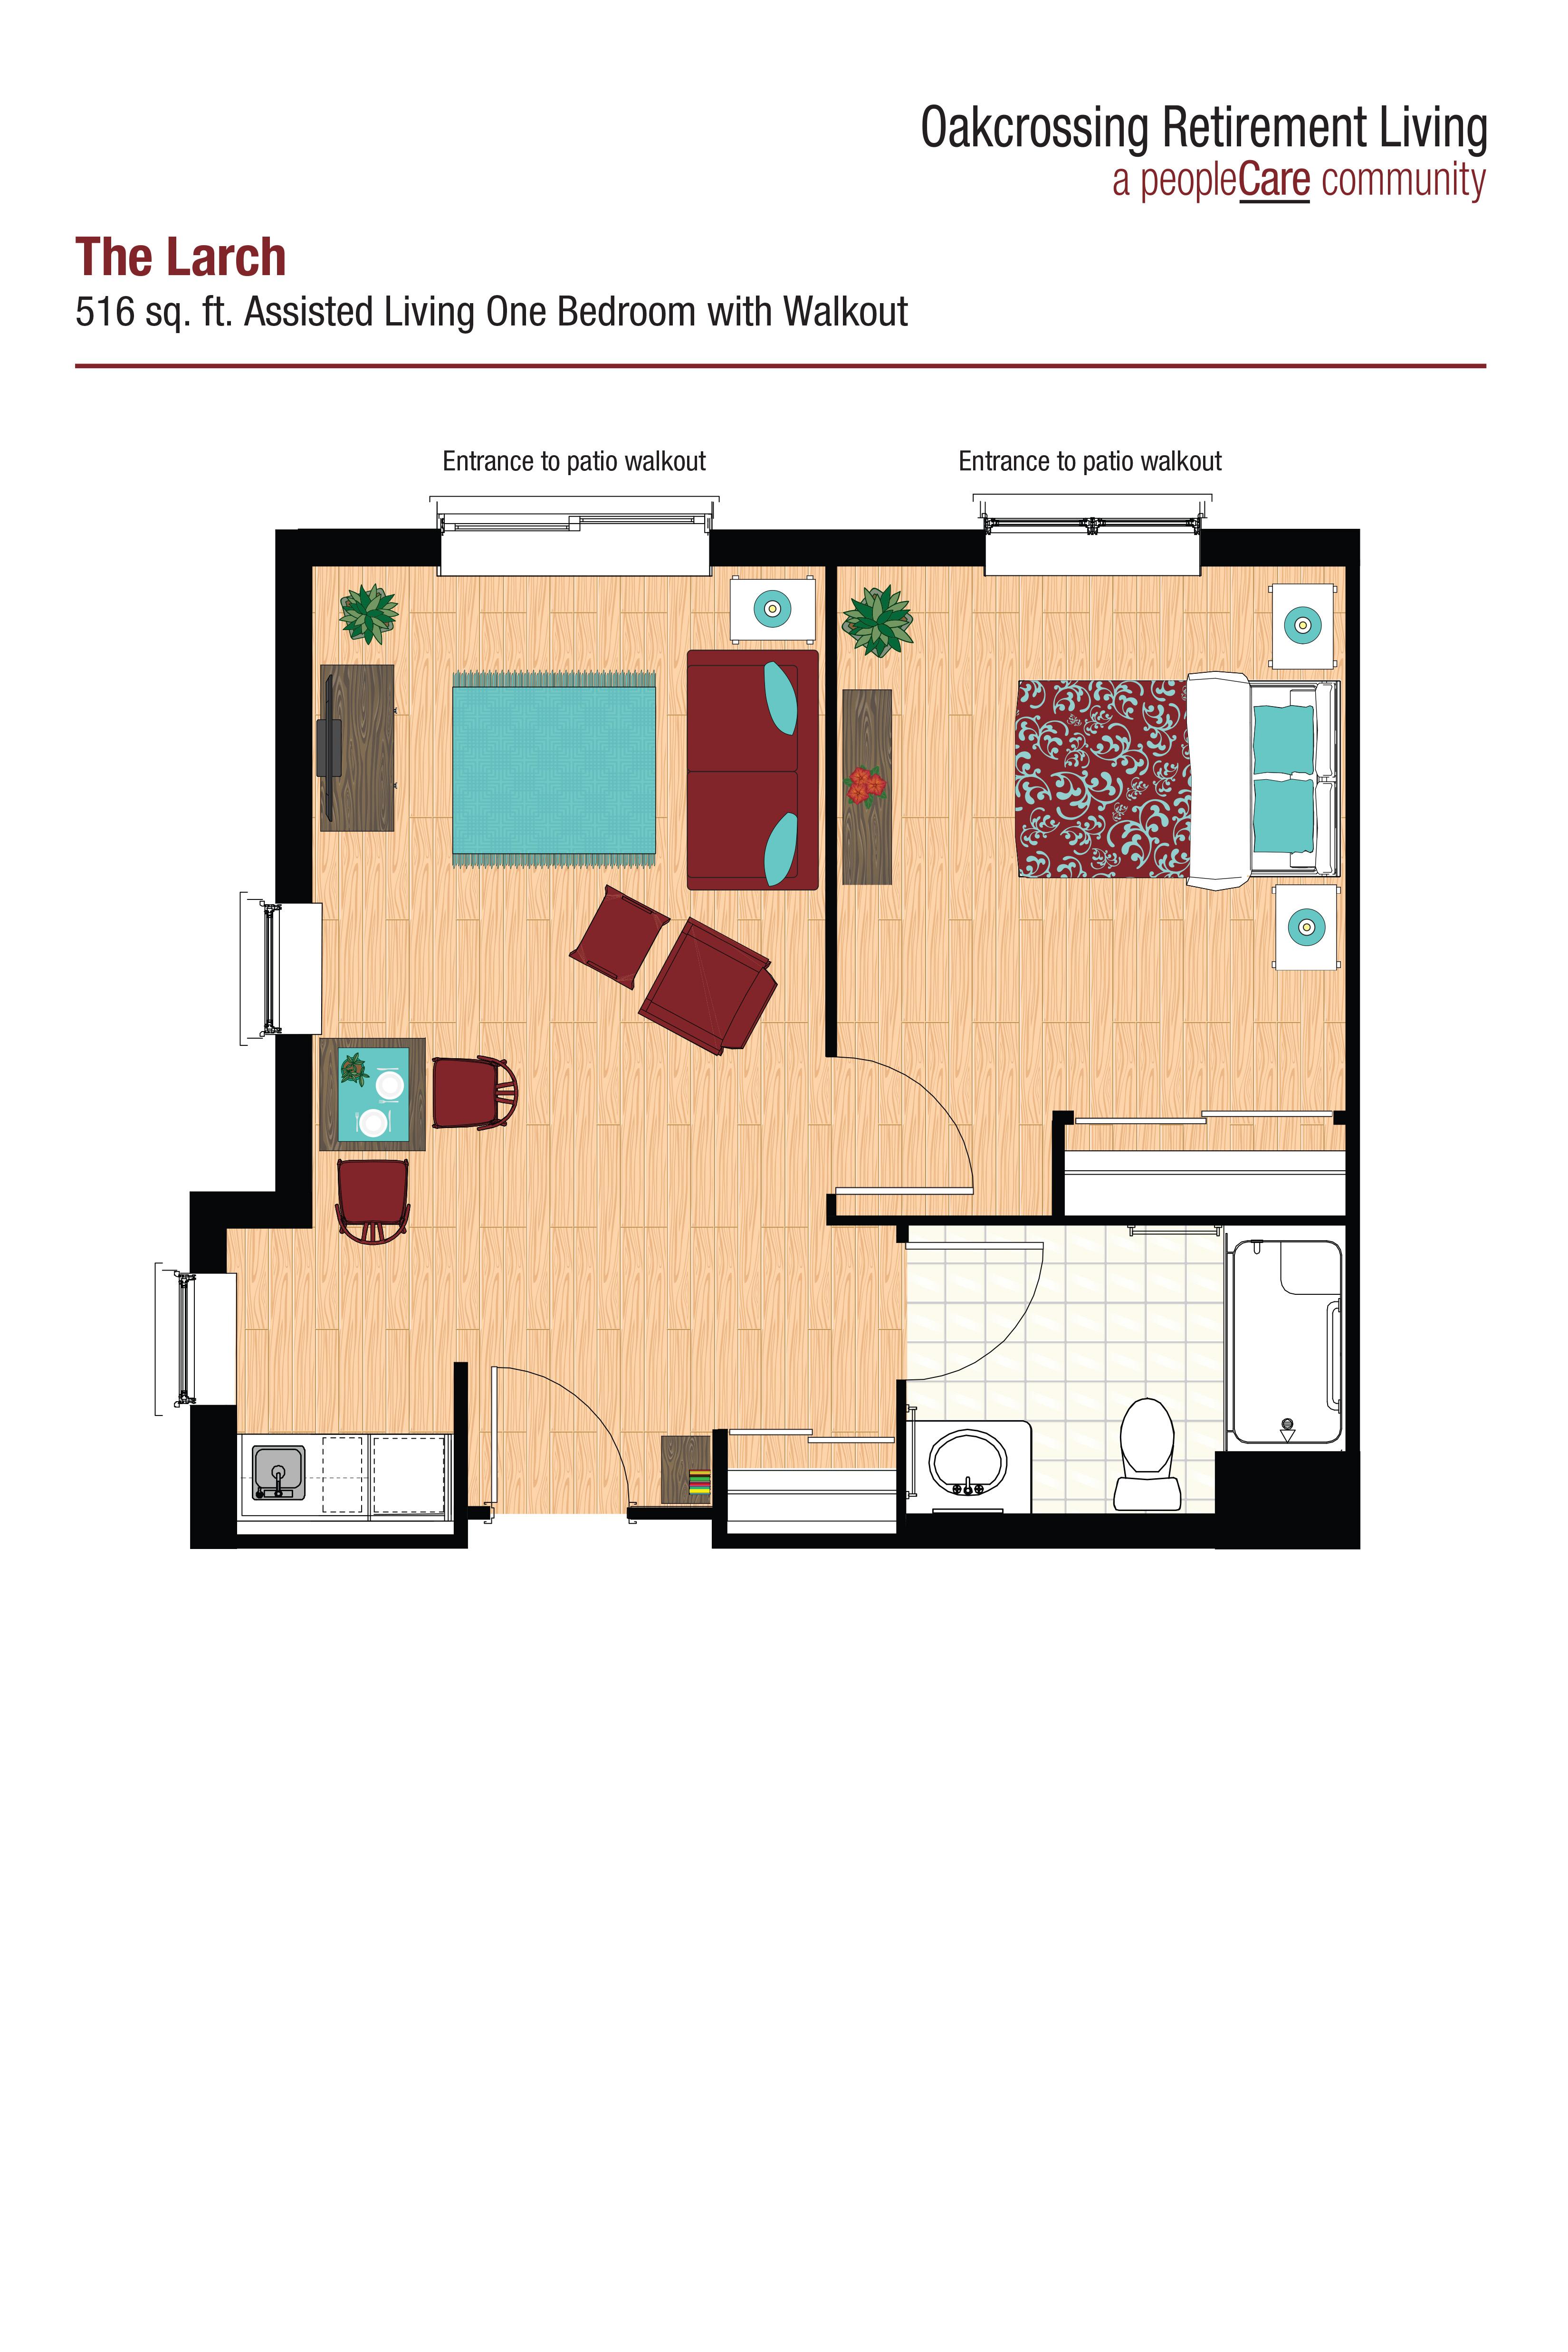 Oakcrossing Retirement Living – Floor Plan – The Larch